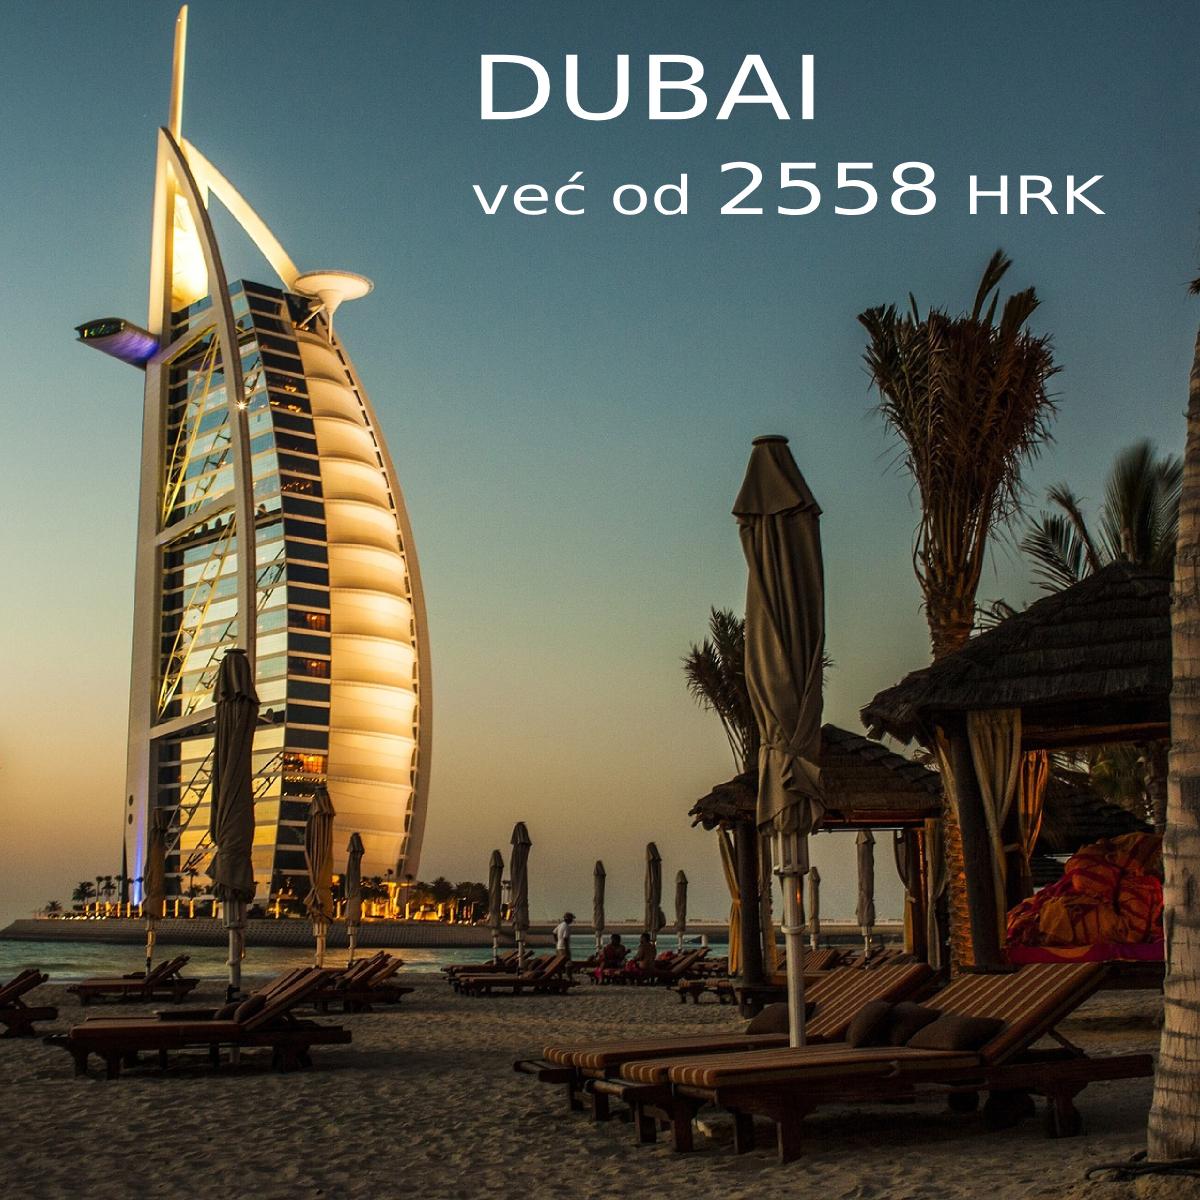 Dubai luksuzni hotel uz plazu